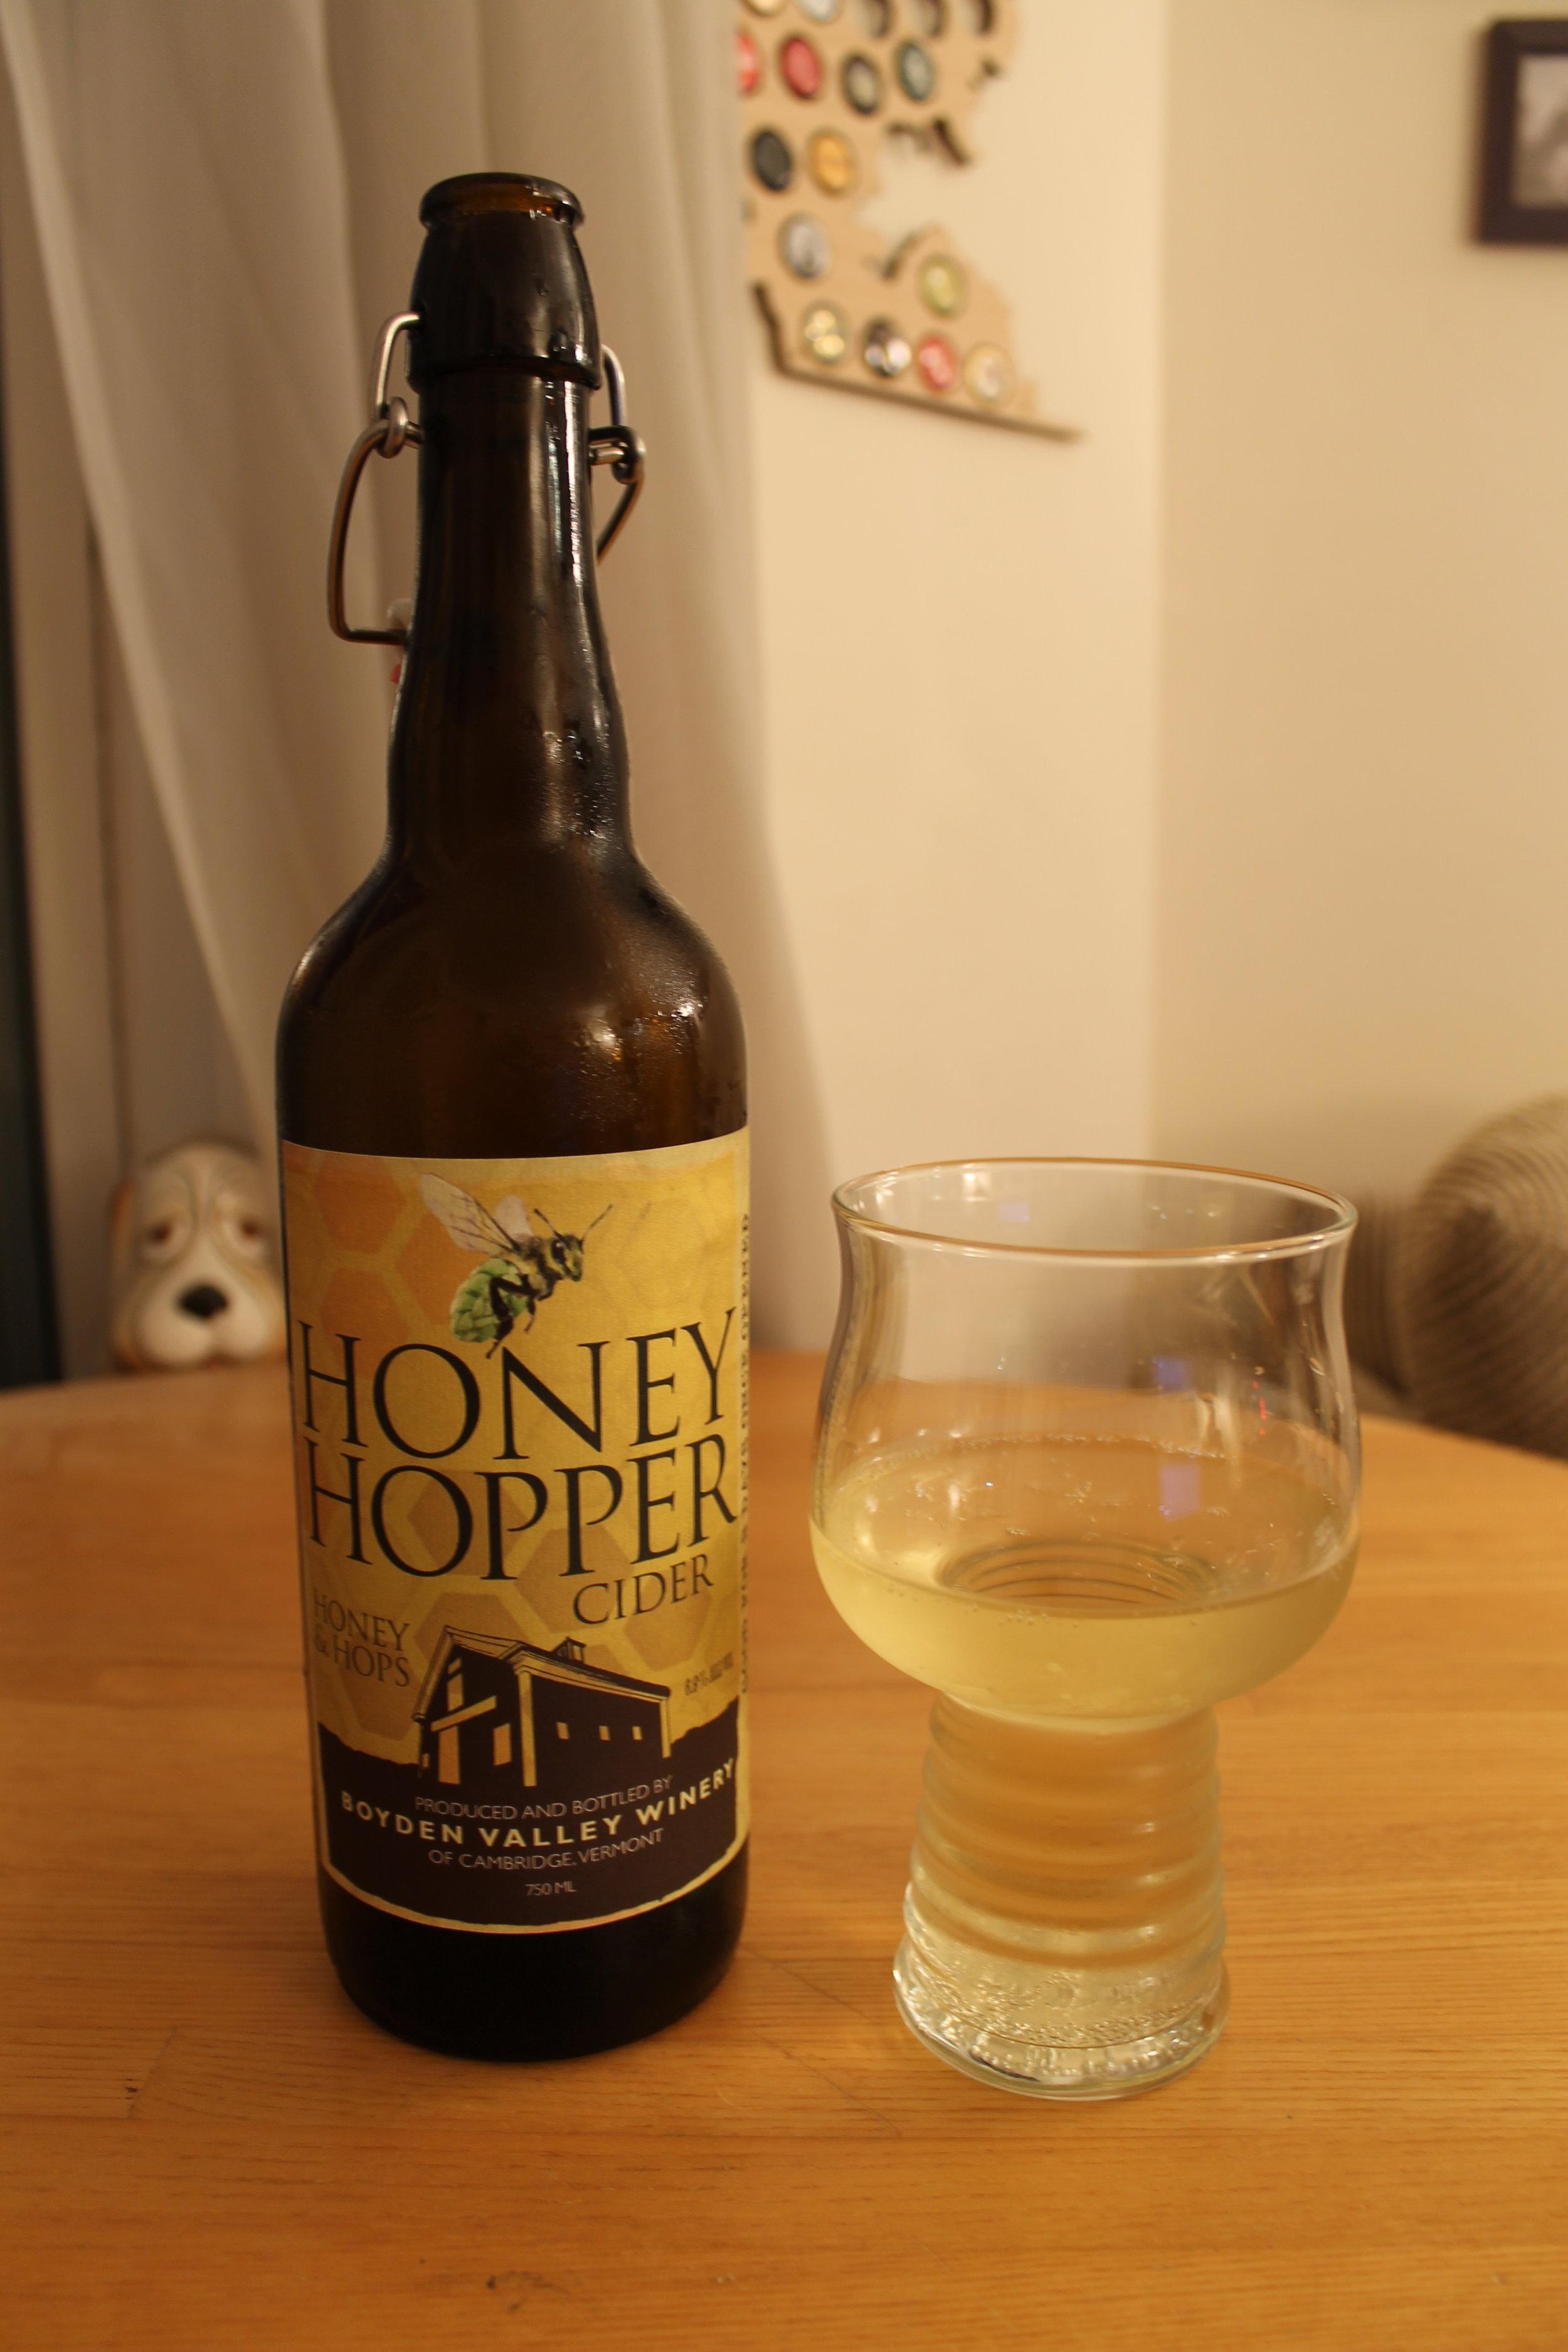 Boyden Valley Winery: Honey Hopper